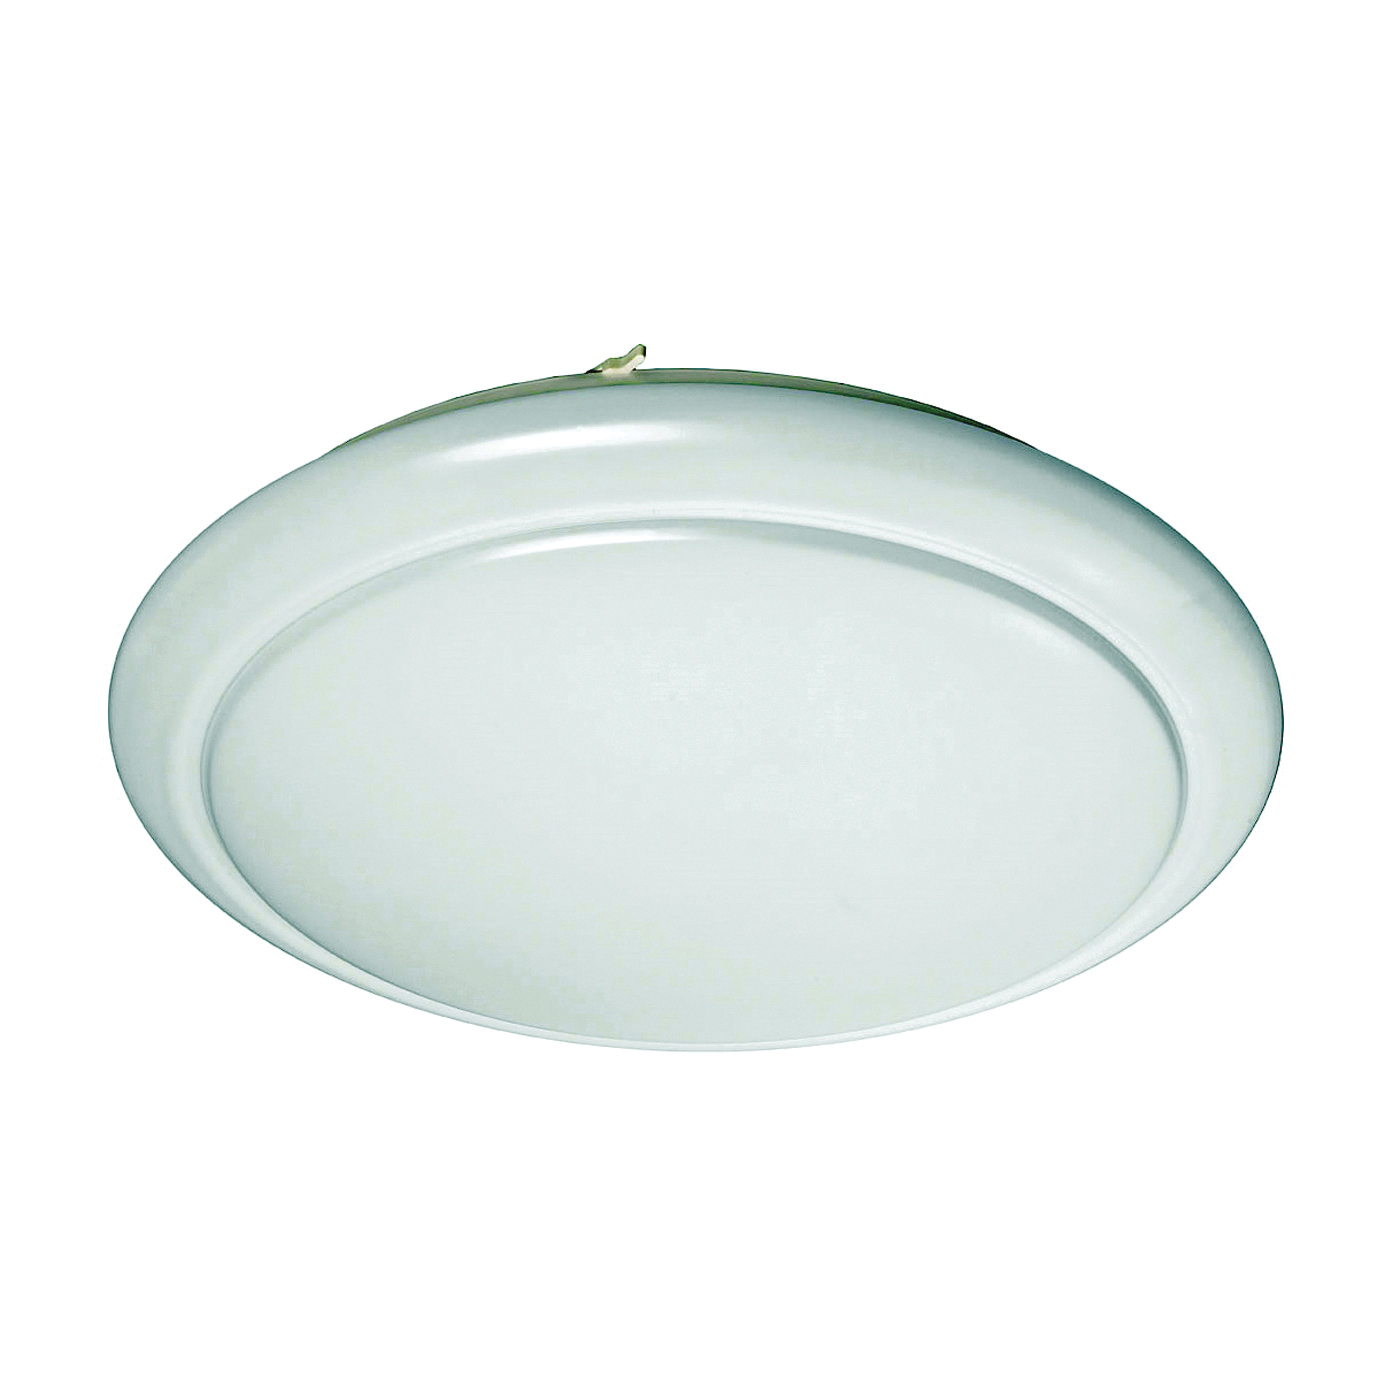 Picture of ETI 54614142 Light Fixture, 120 V, 40 W, LED Lamp, 2900 Lumens, 4000 K Color Temp, White Fixture